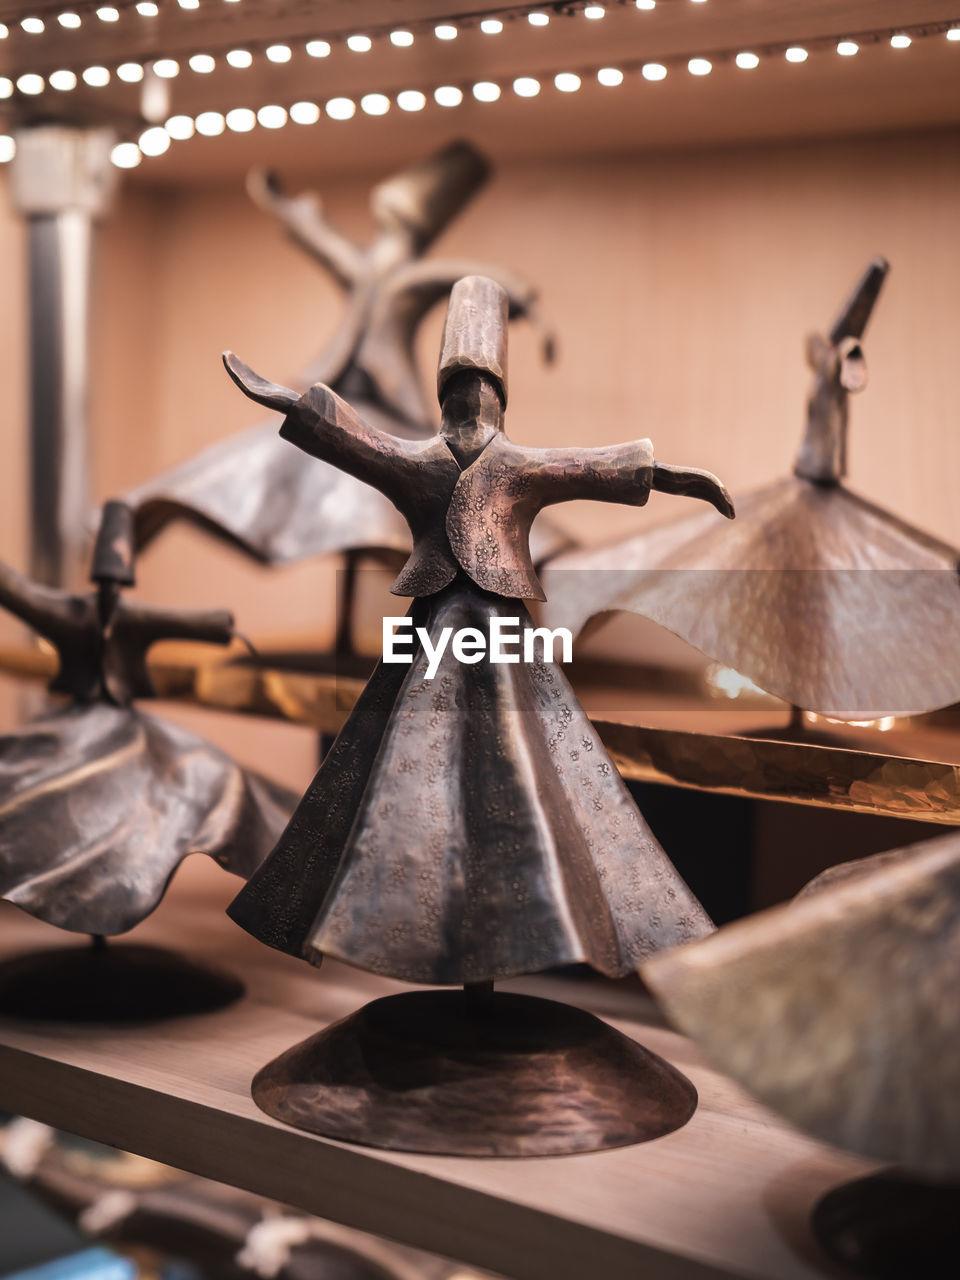 Close-up of metallic figurine